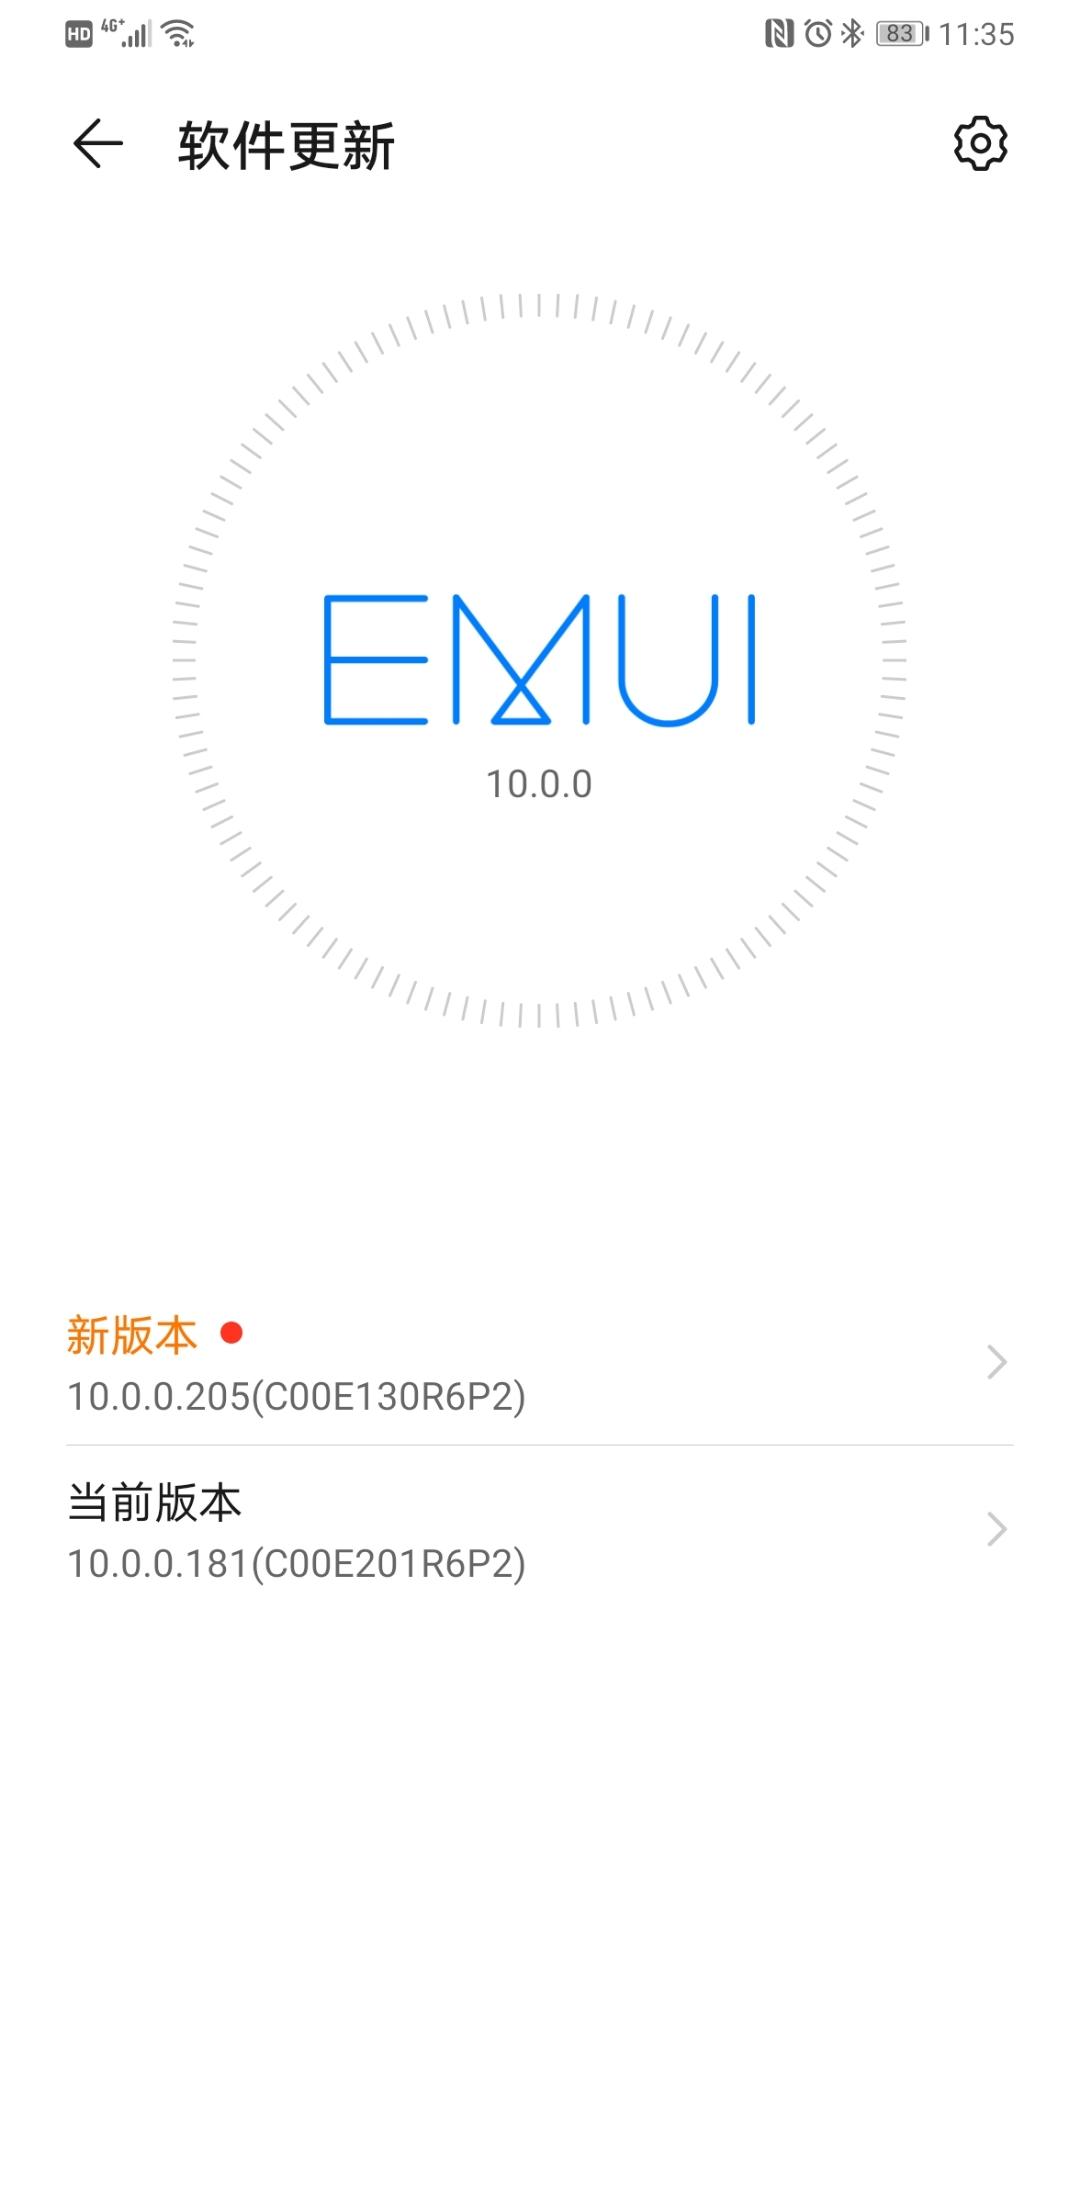 Screenshot_20200604_113512_com.huawei.android.hwouc.jpg